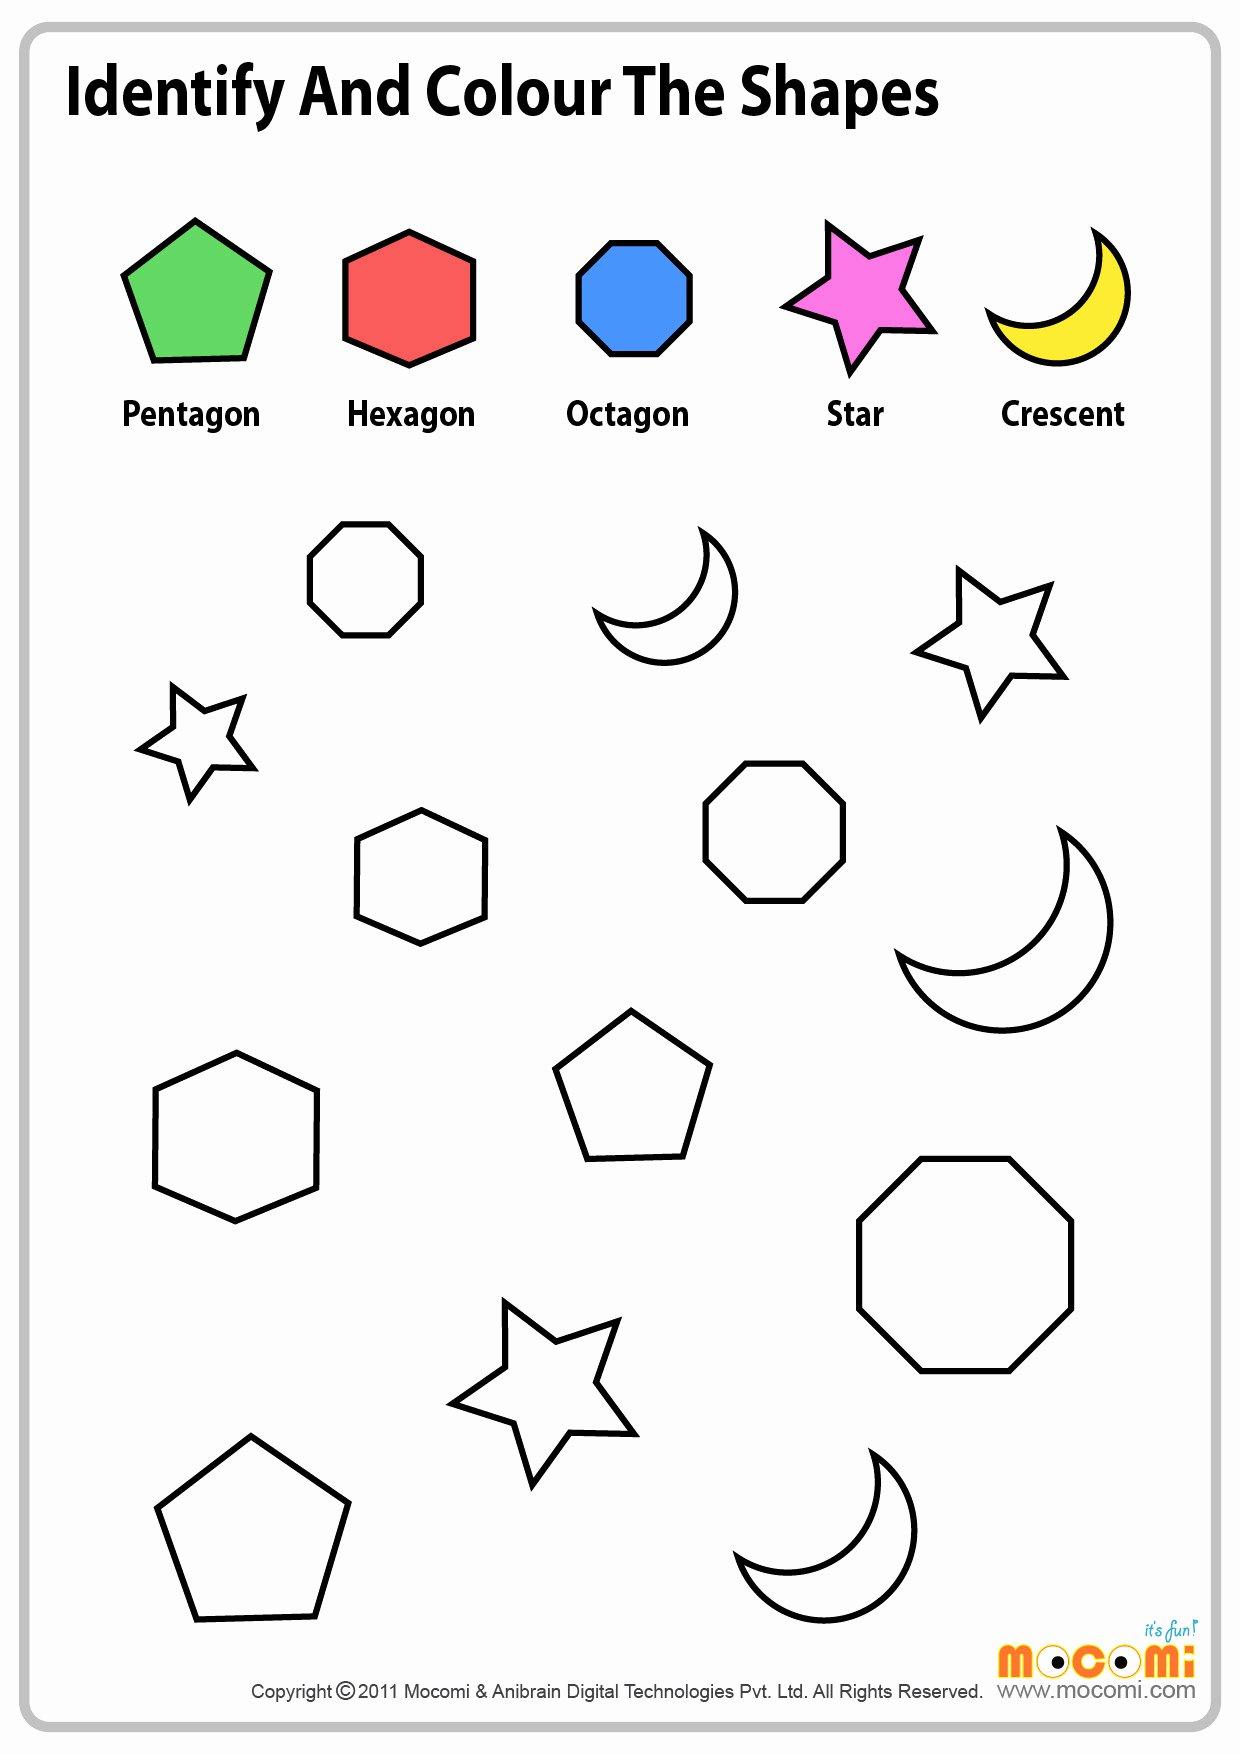 Crescent Shape Worksheets for Preschoolers Beautiful Colour Similar Shapes Maths Worksheet for Kids Mo I